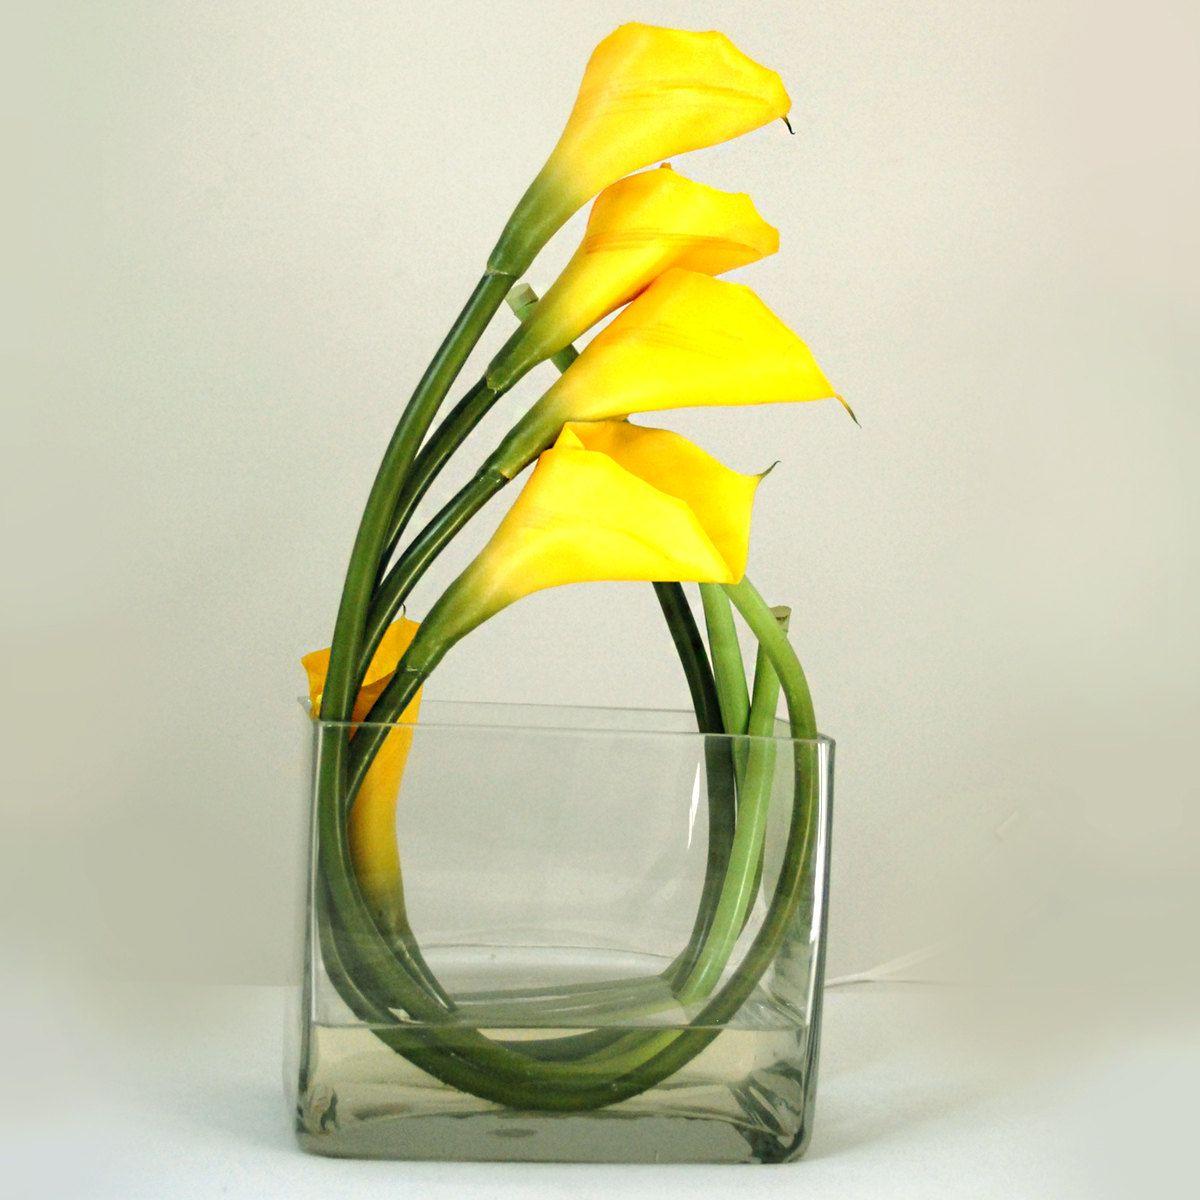 Real touch yellow calla lily square glass vase wedding ideas calla lily faux floral arrangements centerpieces for home decor modern artificial flower arrangements dhlflorist Images